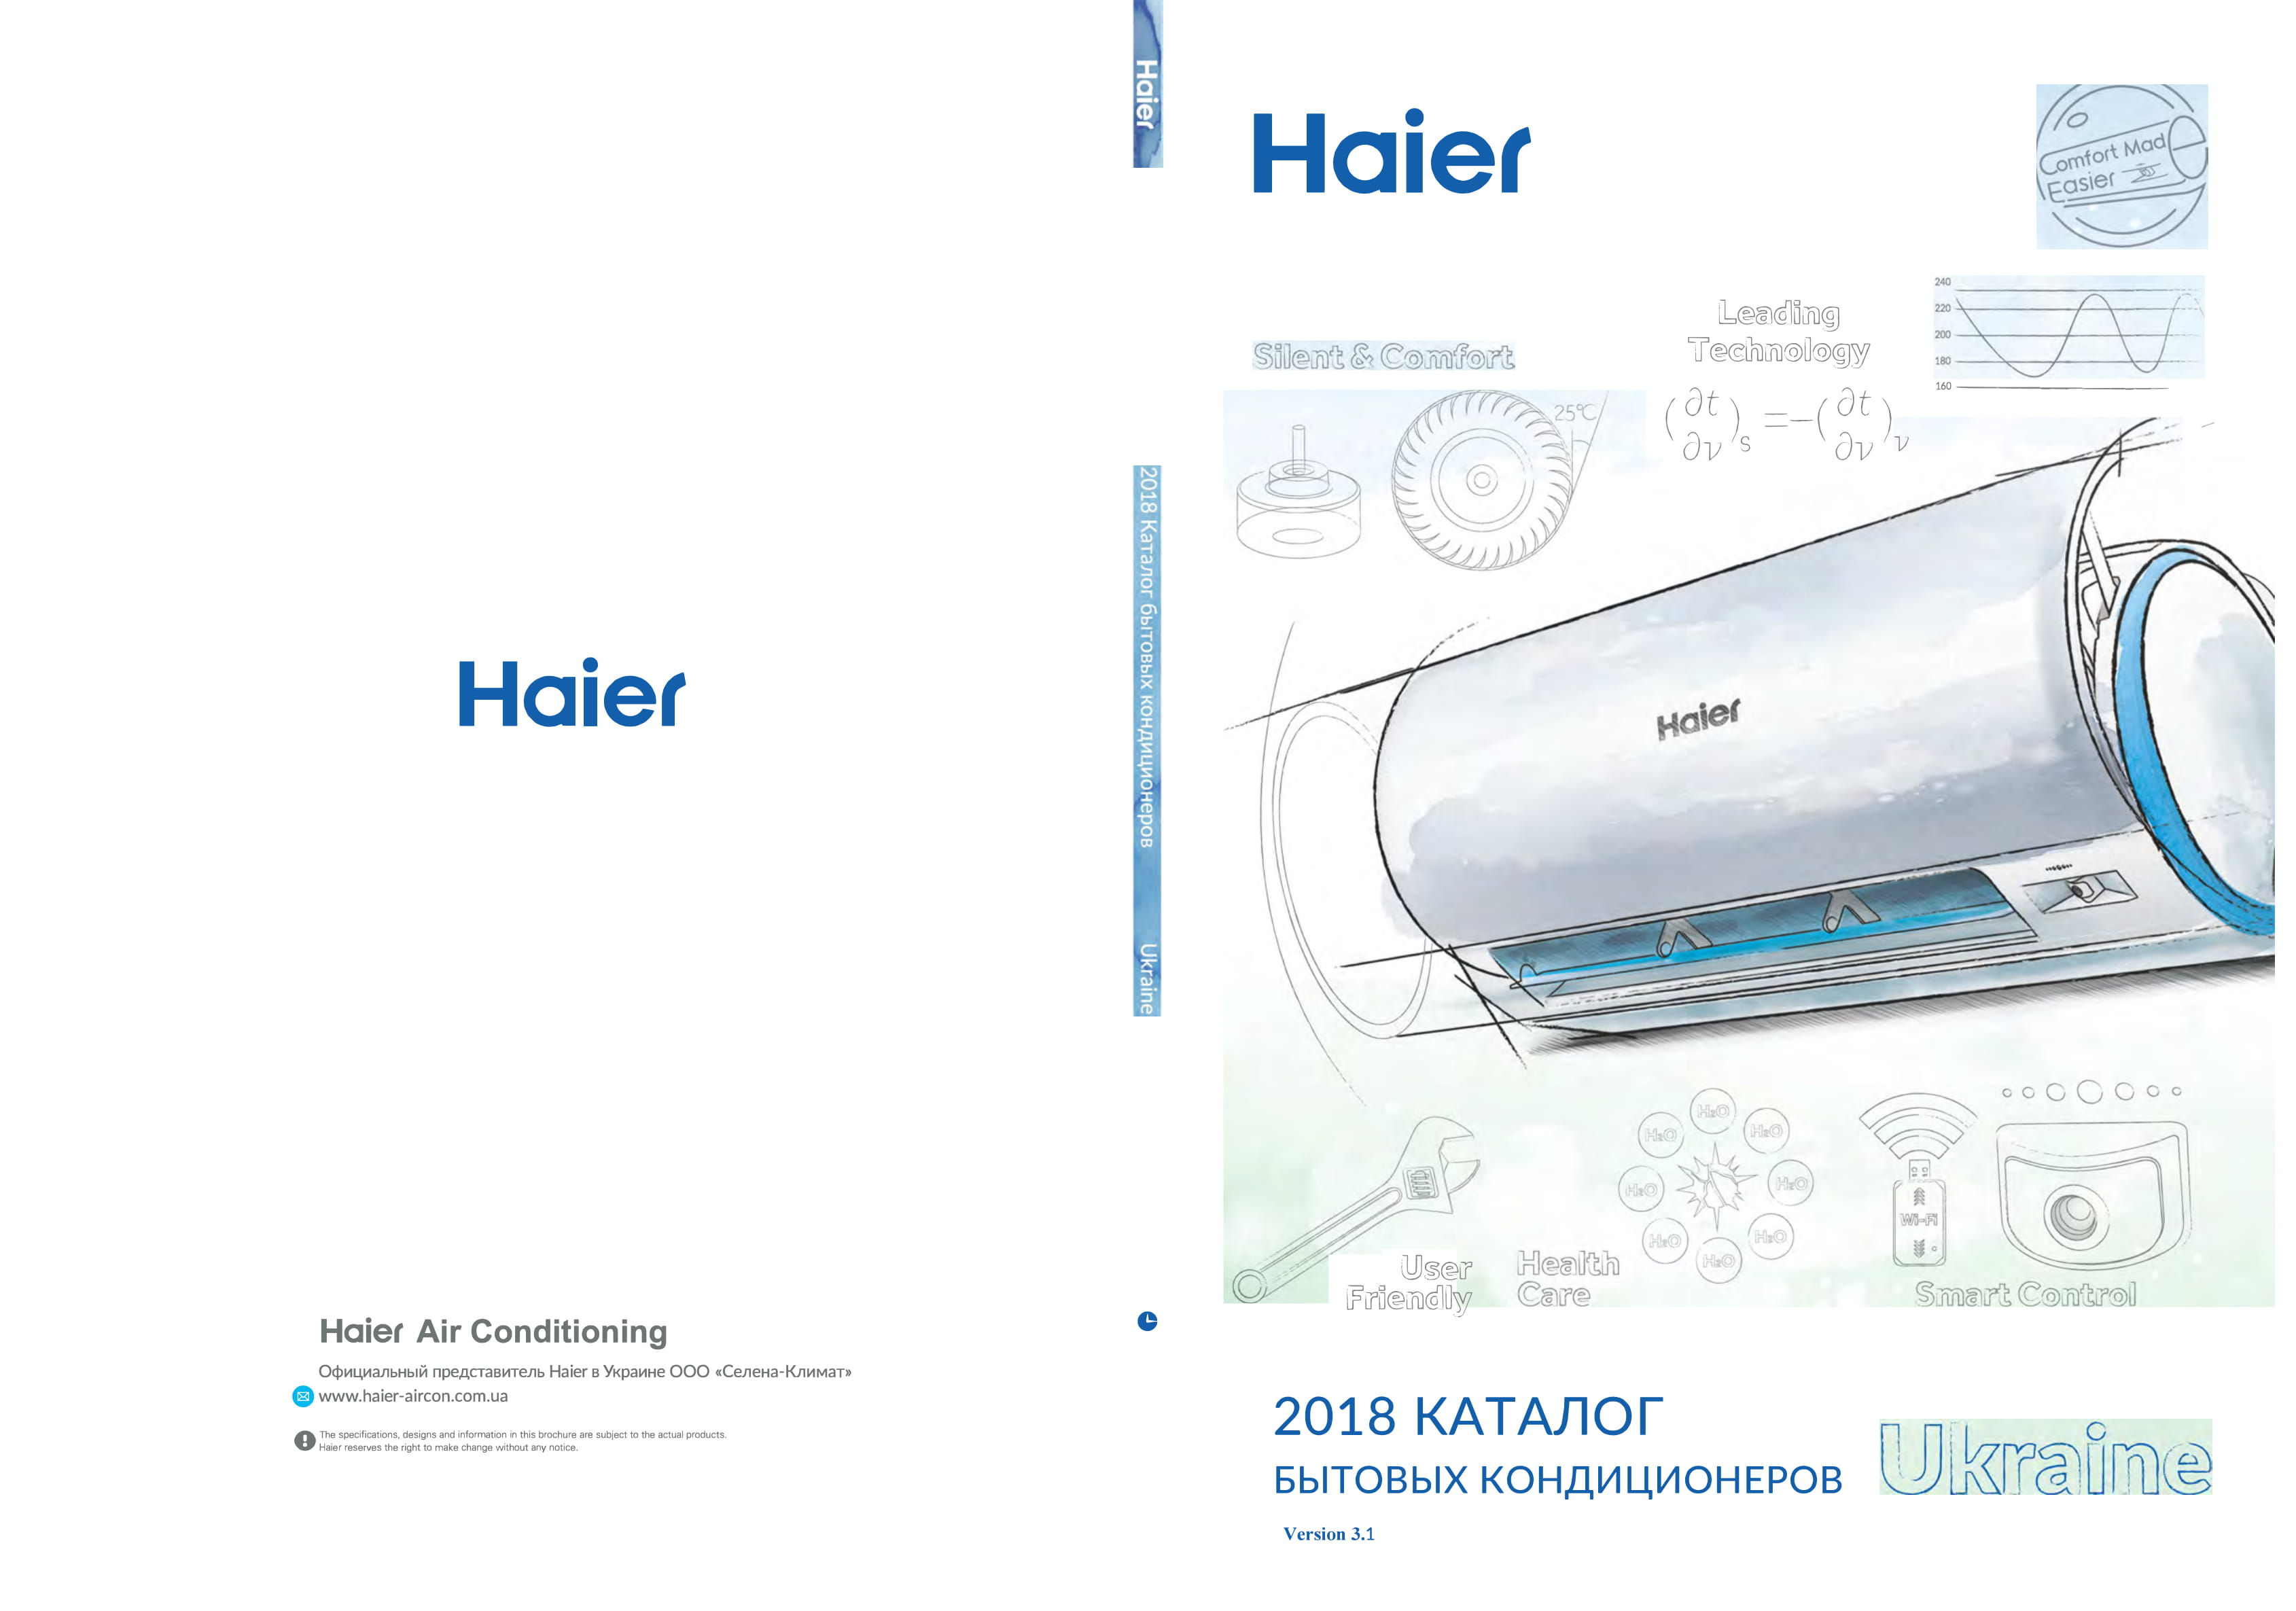 Haiet Air Conditioning